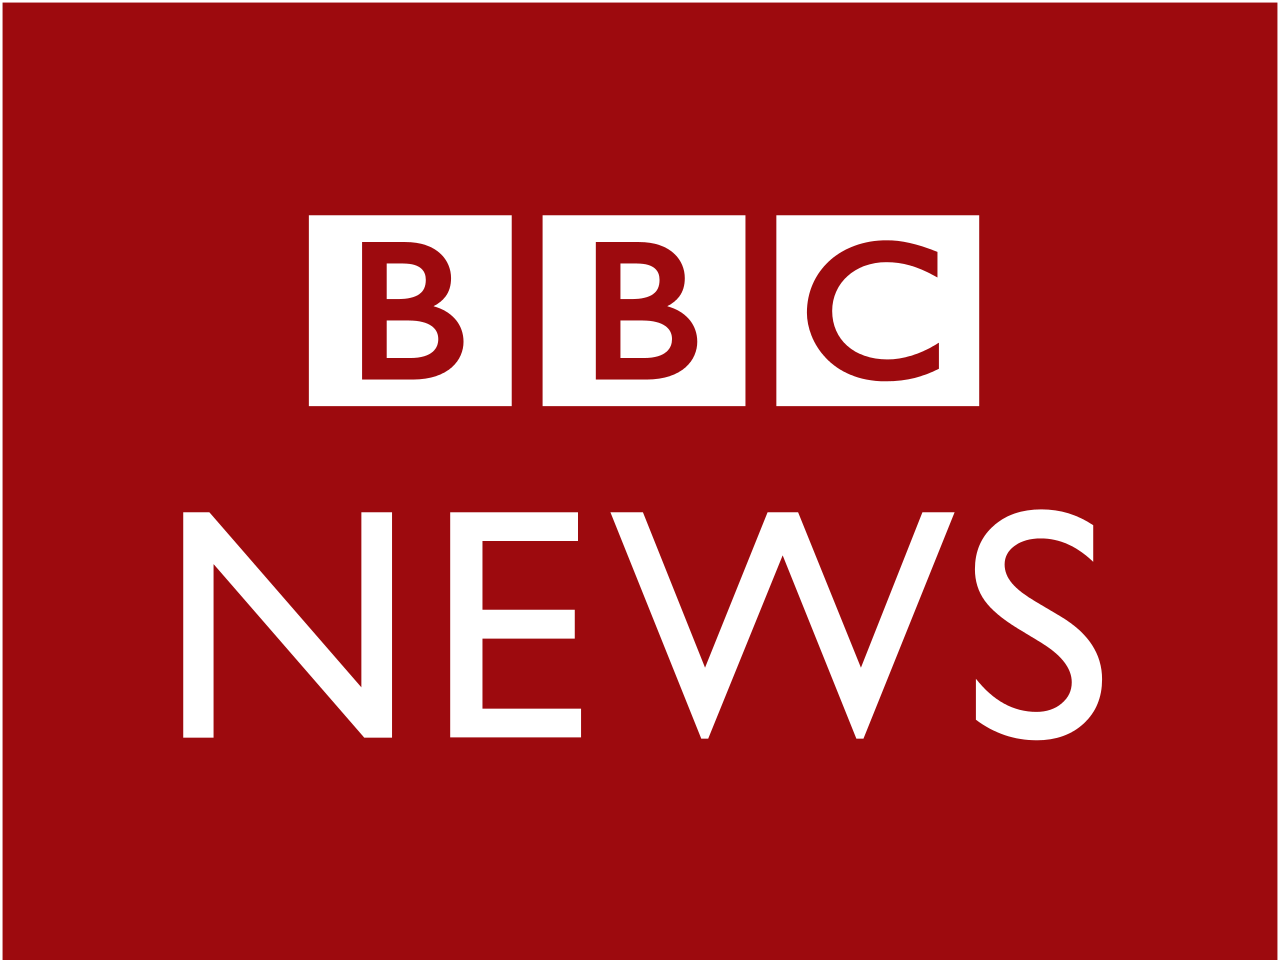 BBC_News.svg